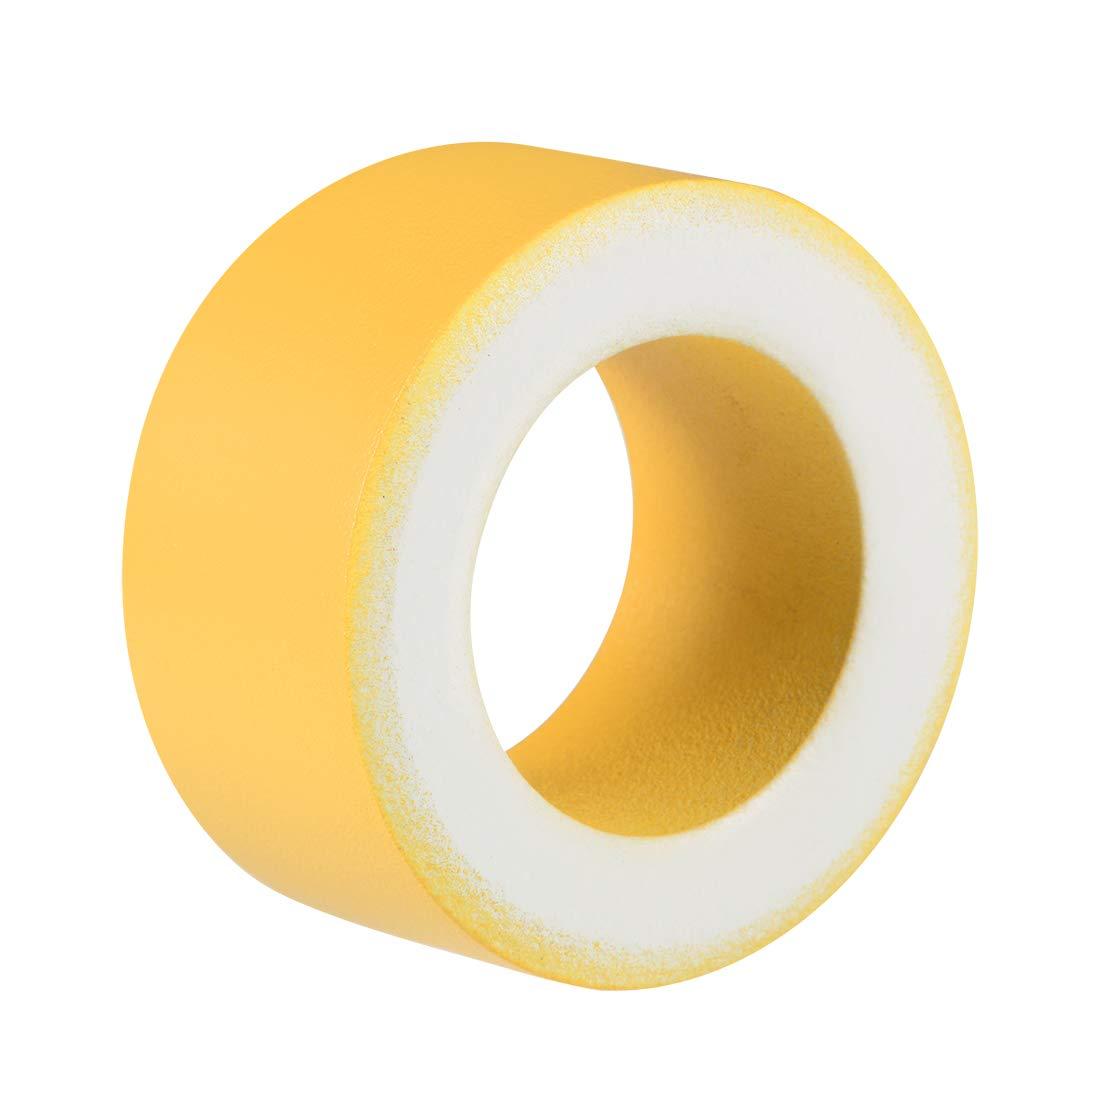 uxcell 31.3 x 51.3 x 25.5mm Ferrite Ring Iron Powder Toroid Cores Yellow White